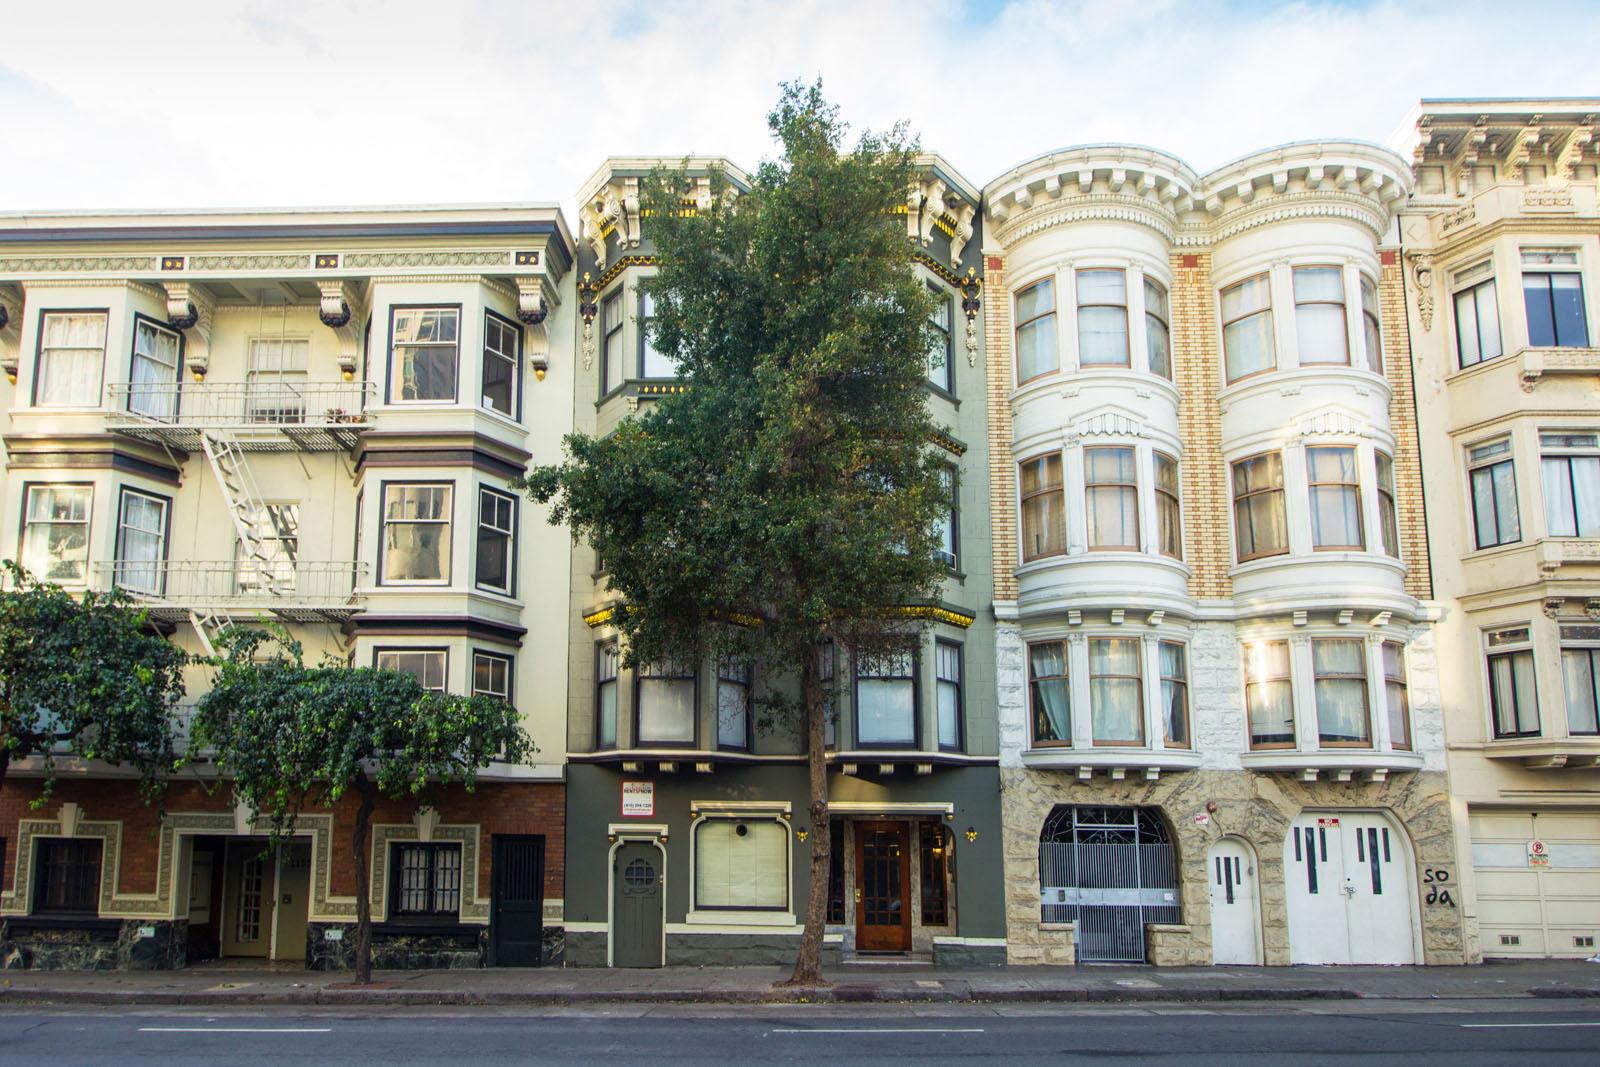 San Francisco photogallery 3